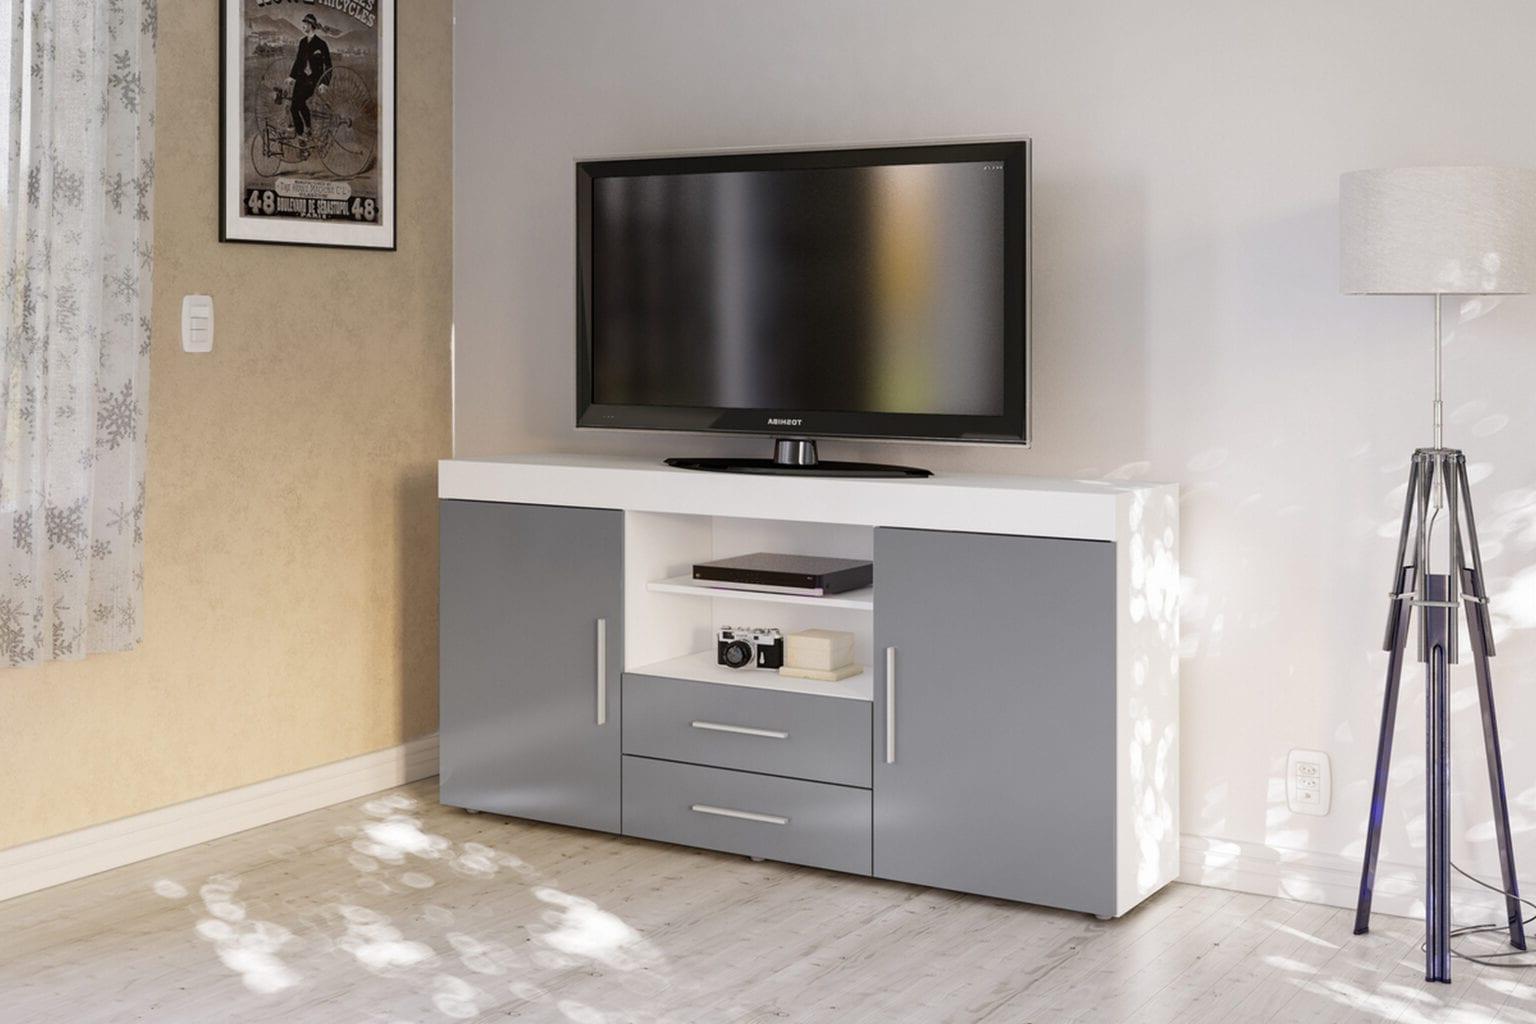 Latest Edgeware 2 Door 2 Drawer Sideboard White & Grey – Niture Uk For Edgeware Tv Stands (View 7 of 25)